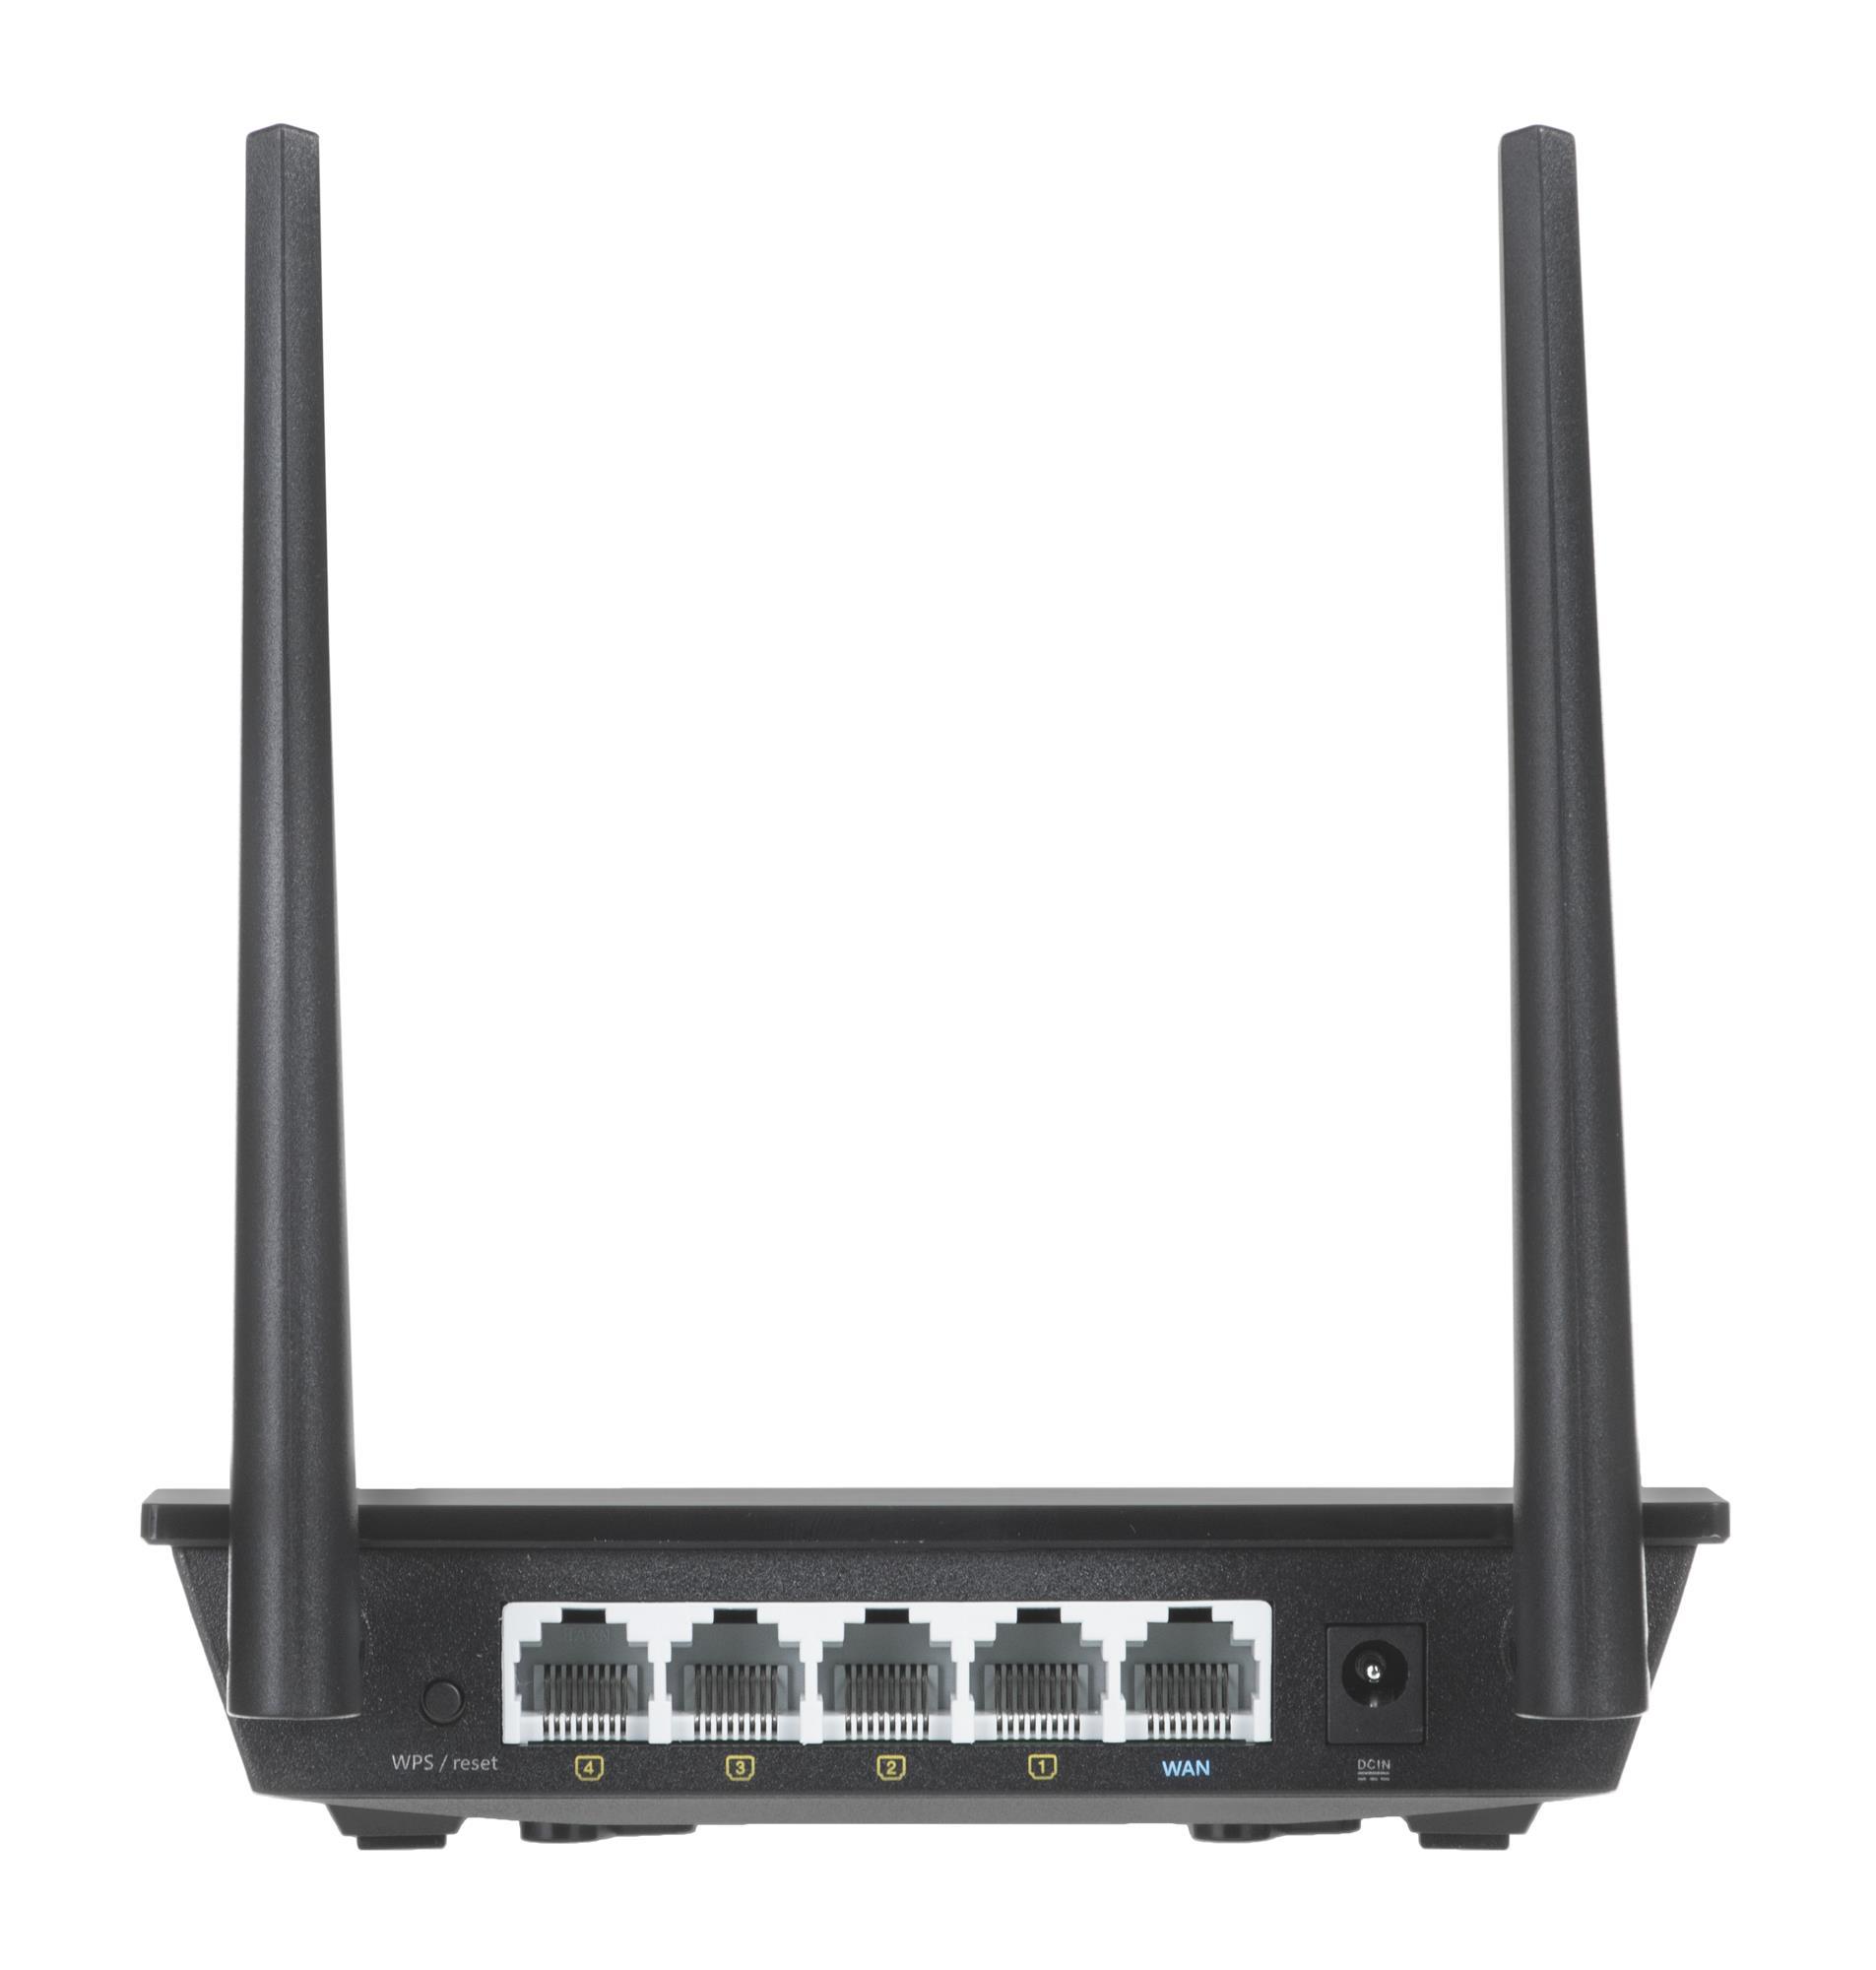 ASUS RT-N12PLUS 2.4 GHz WiFi Rūteris